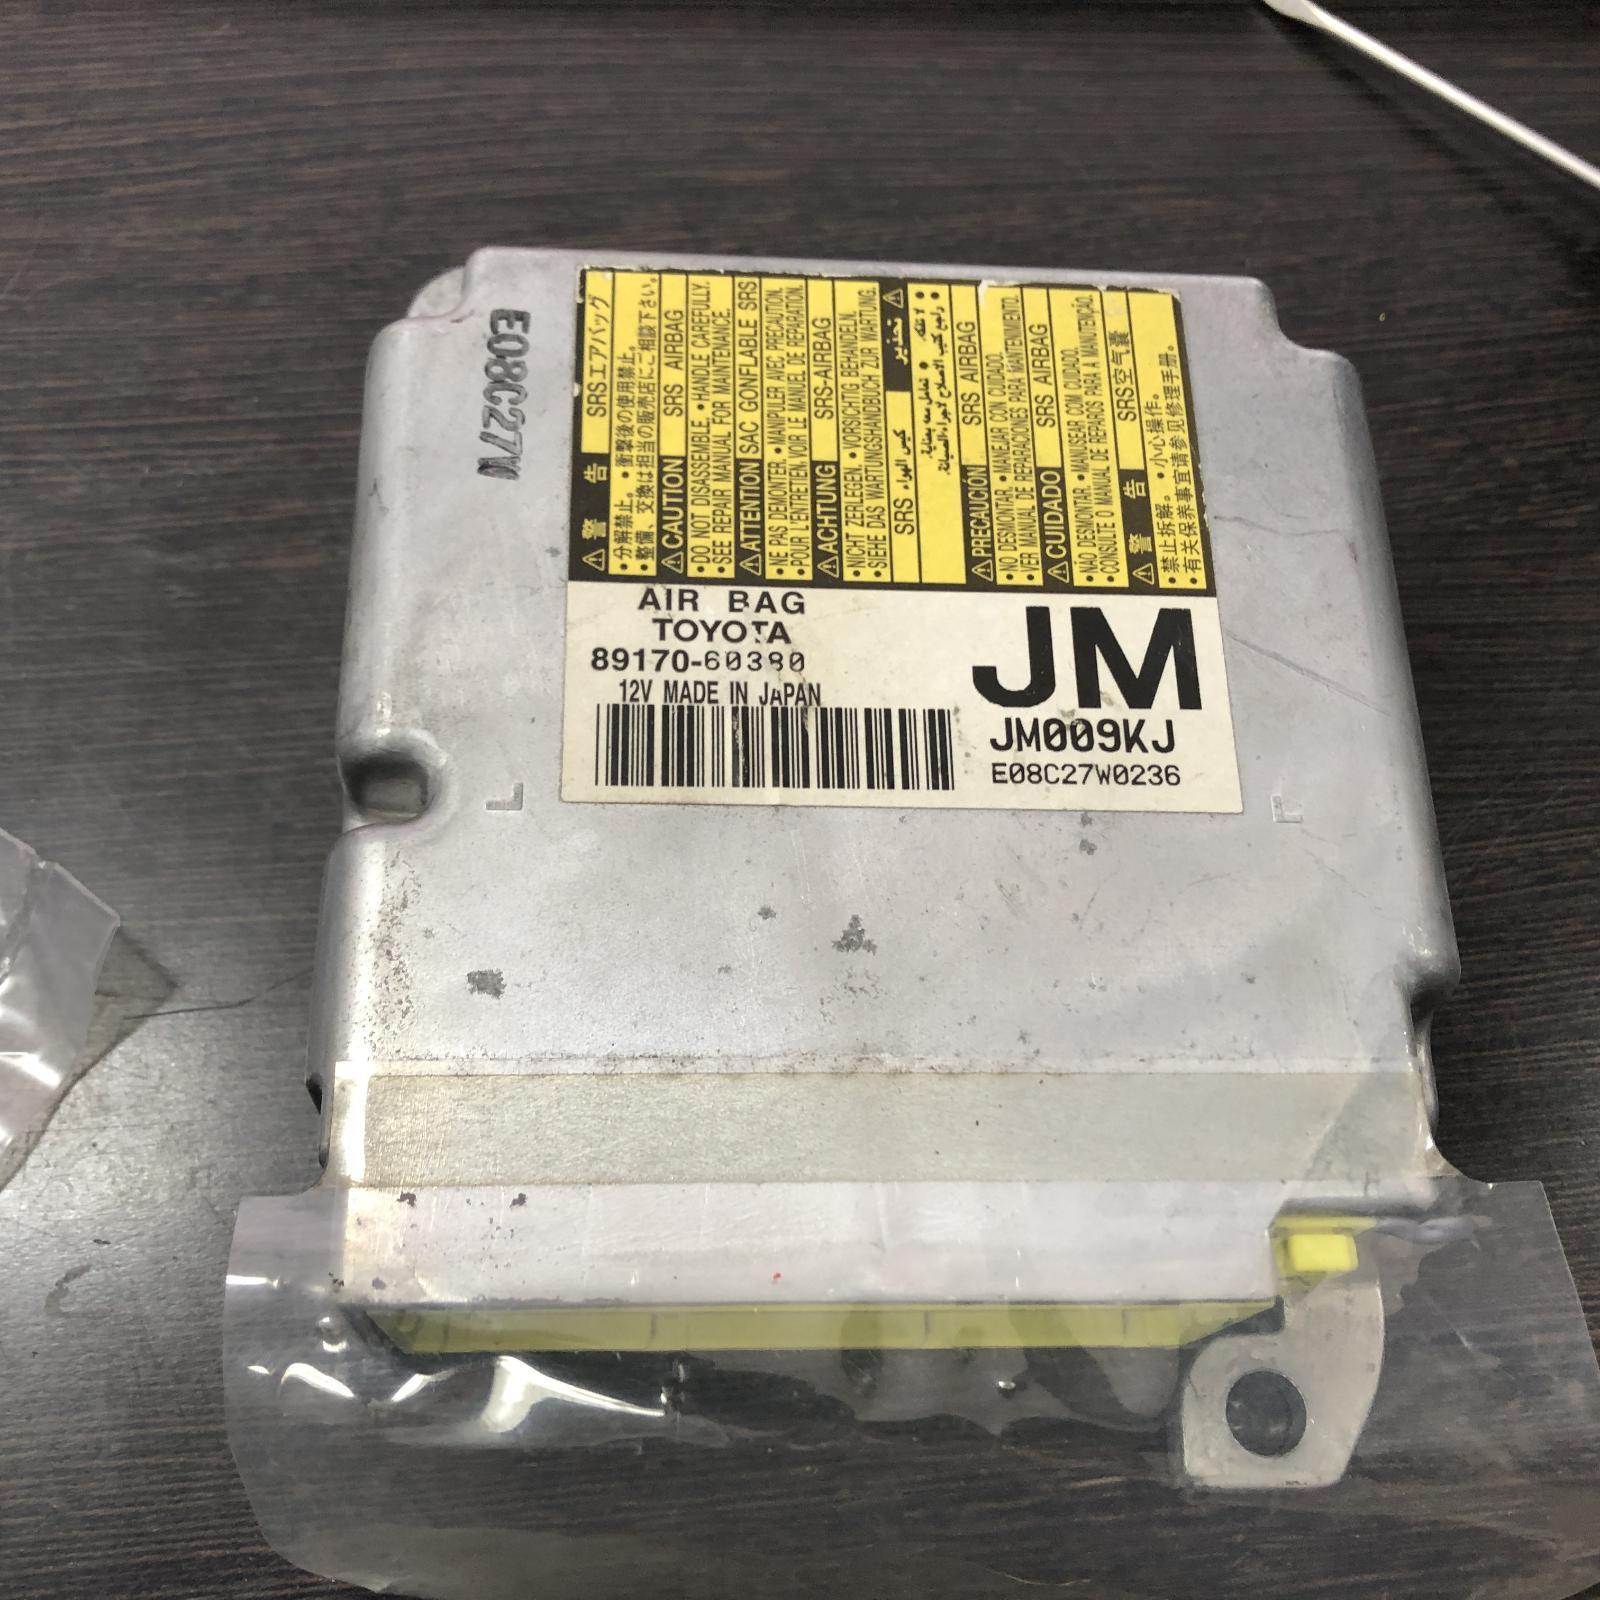 TOYOTA LANDCRUISER, Airbag Module/Sensor, 200 SERIES, 11/07-